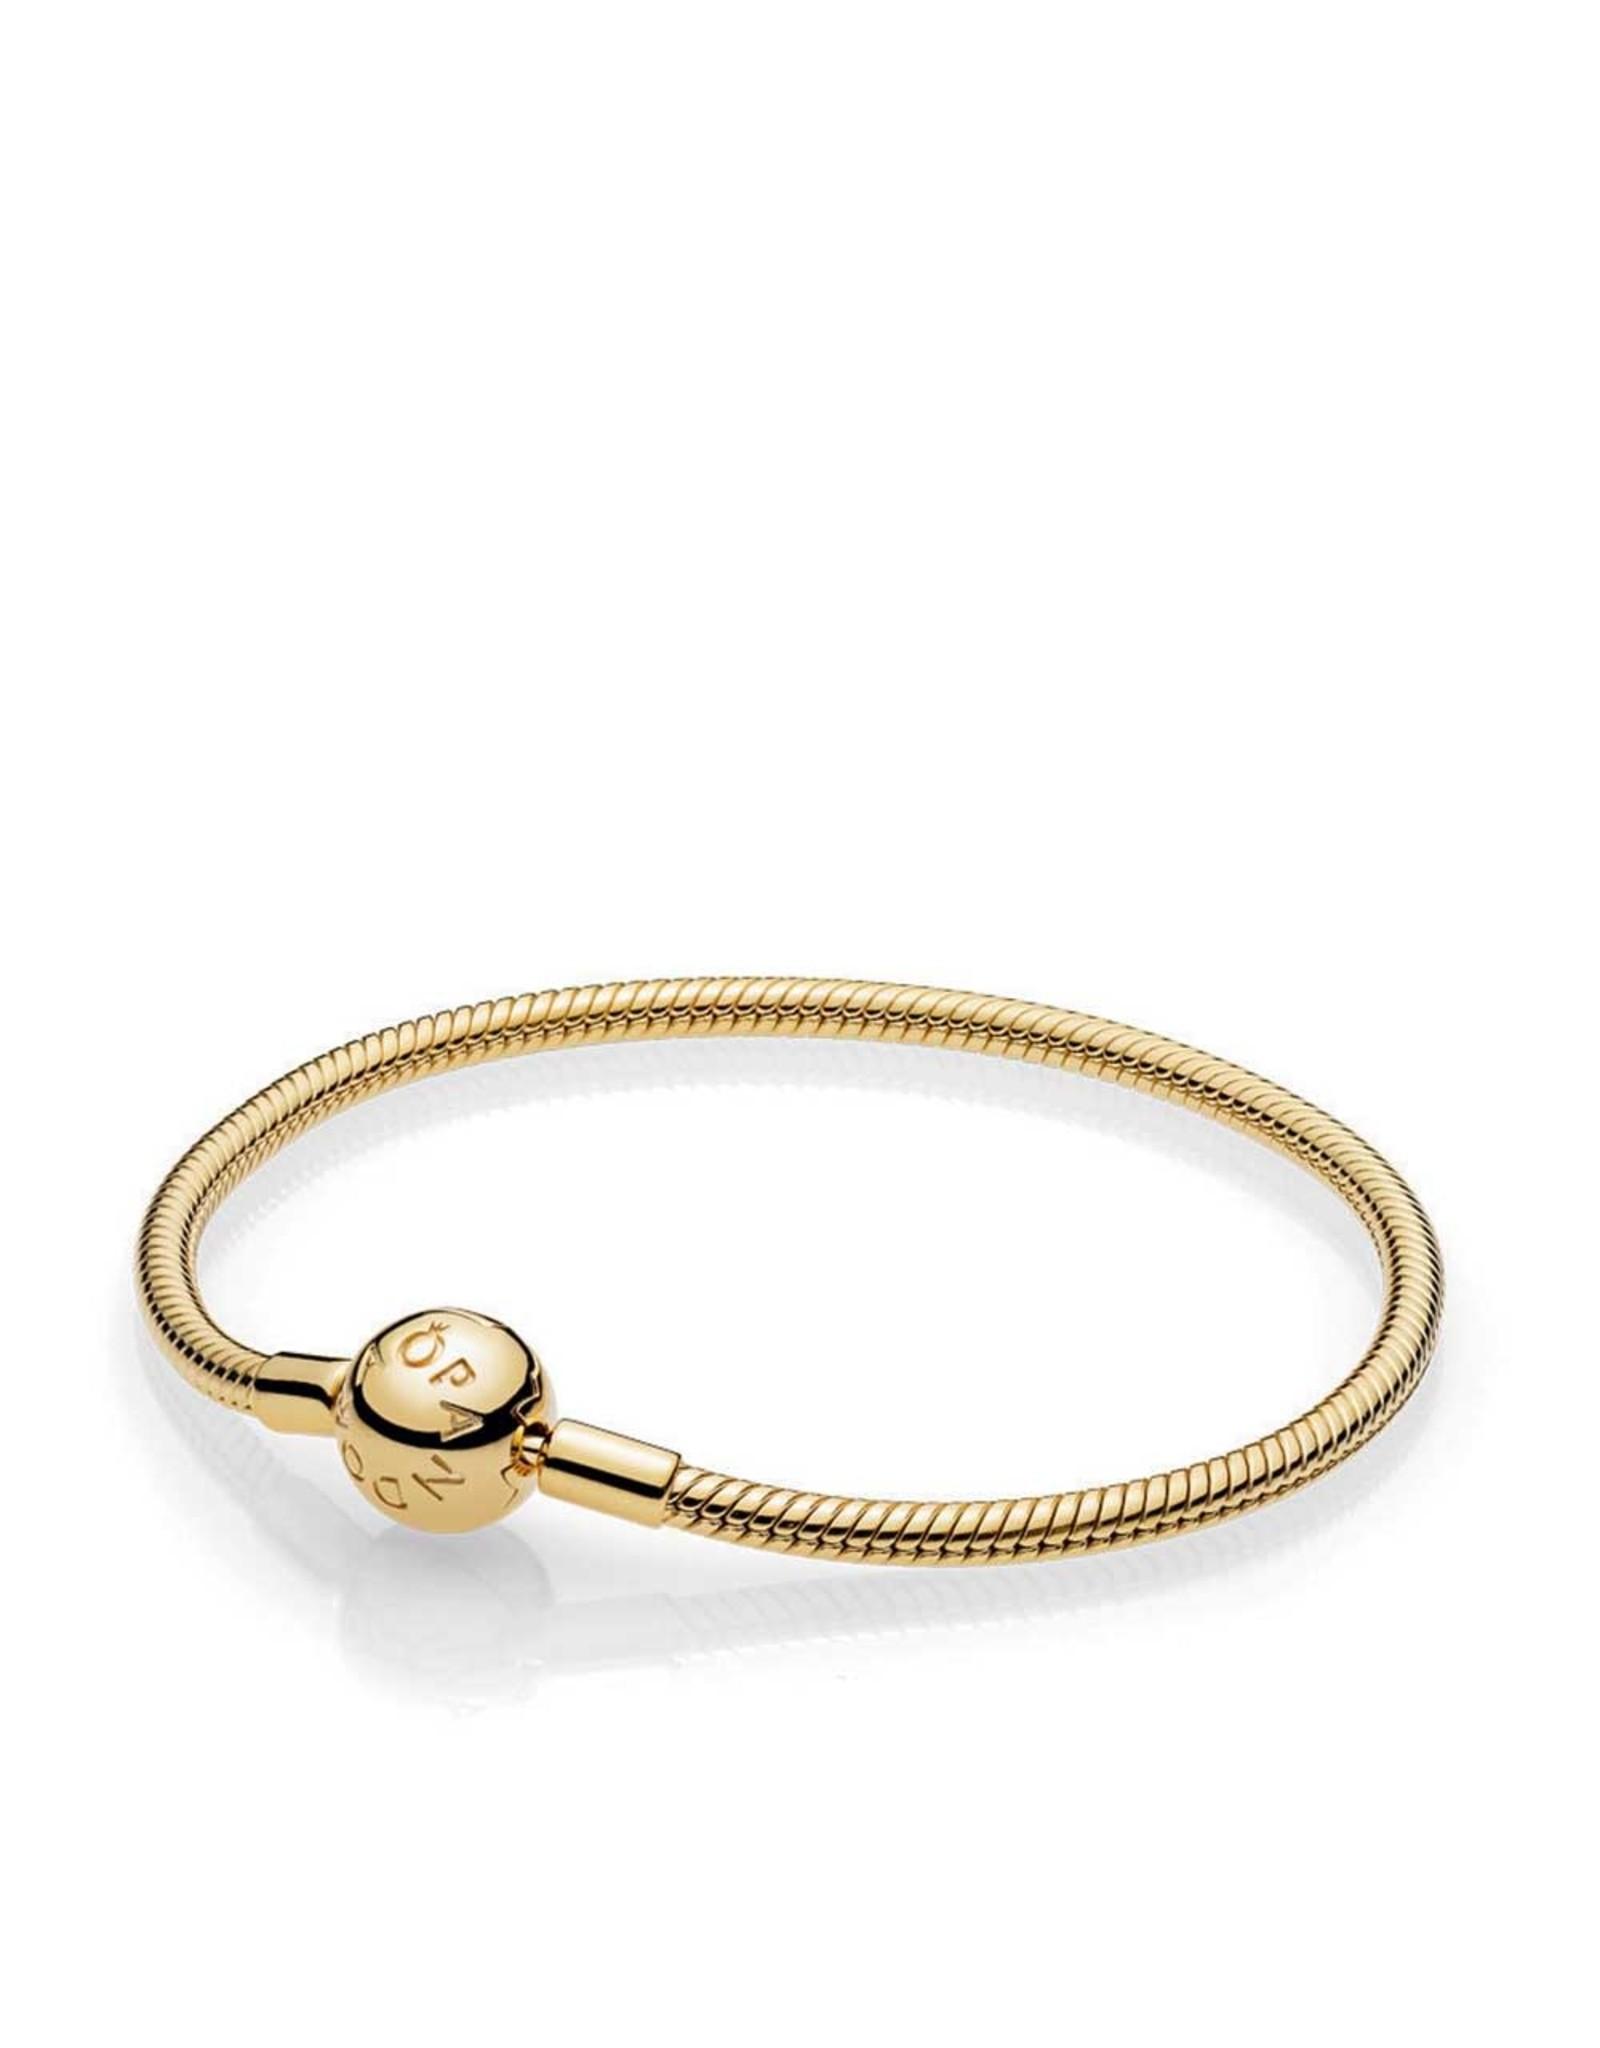 Pandora Pandora Moments Smooth Snake Chain Bracelet With Round Clasp